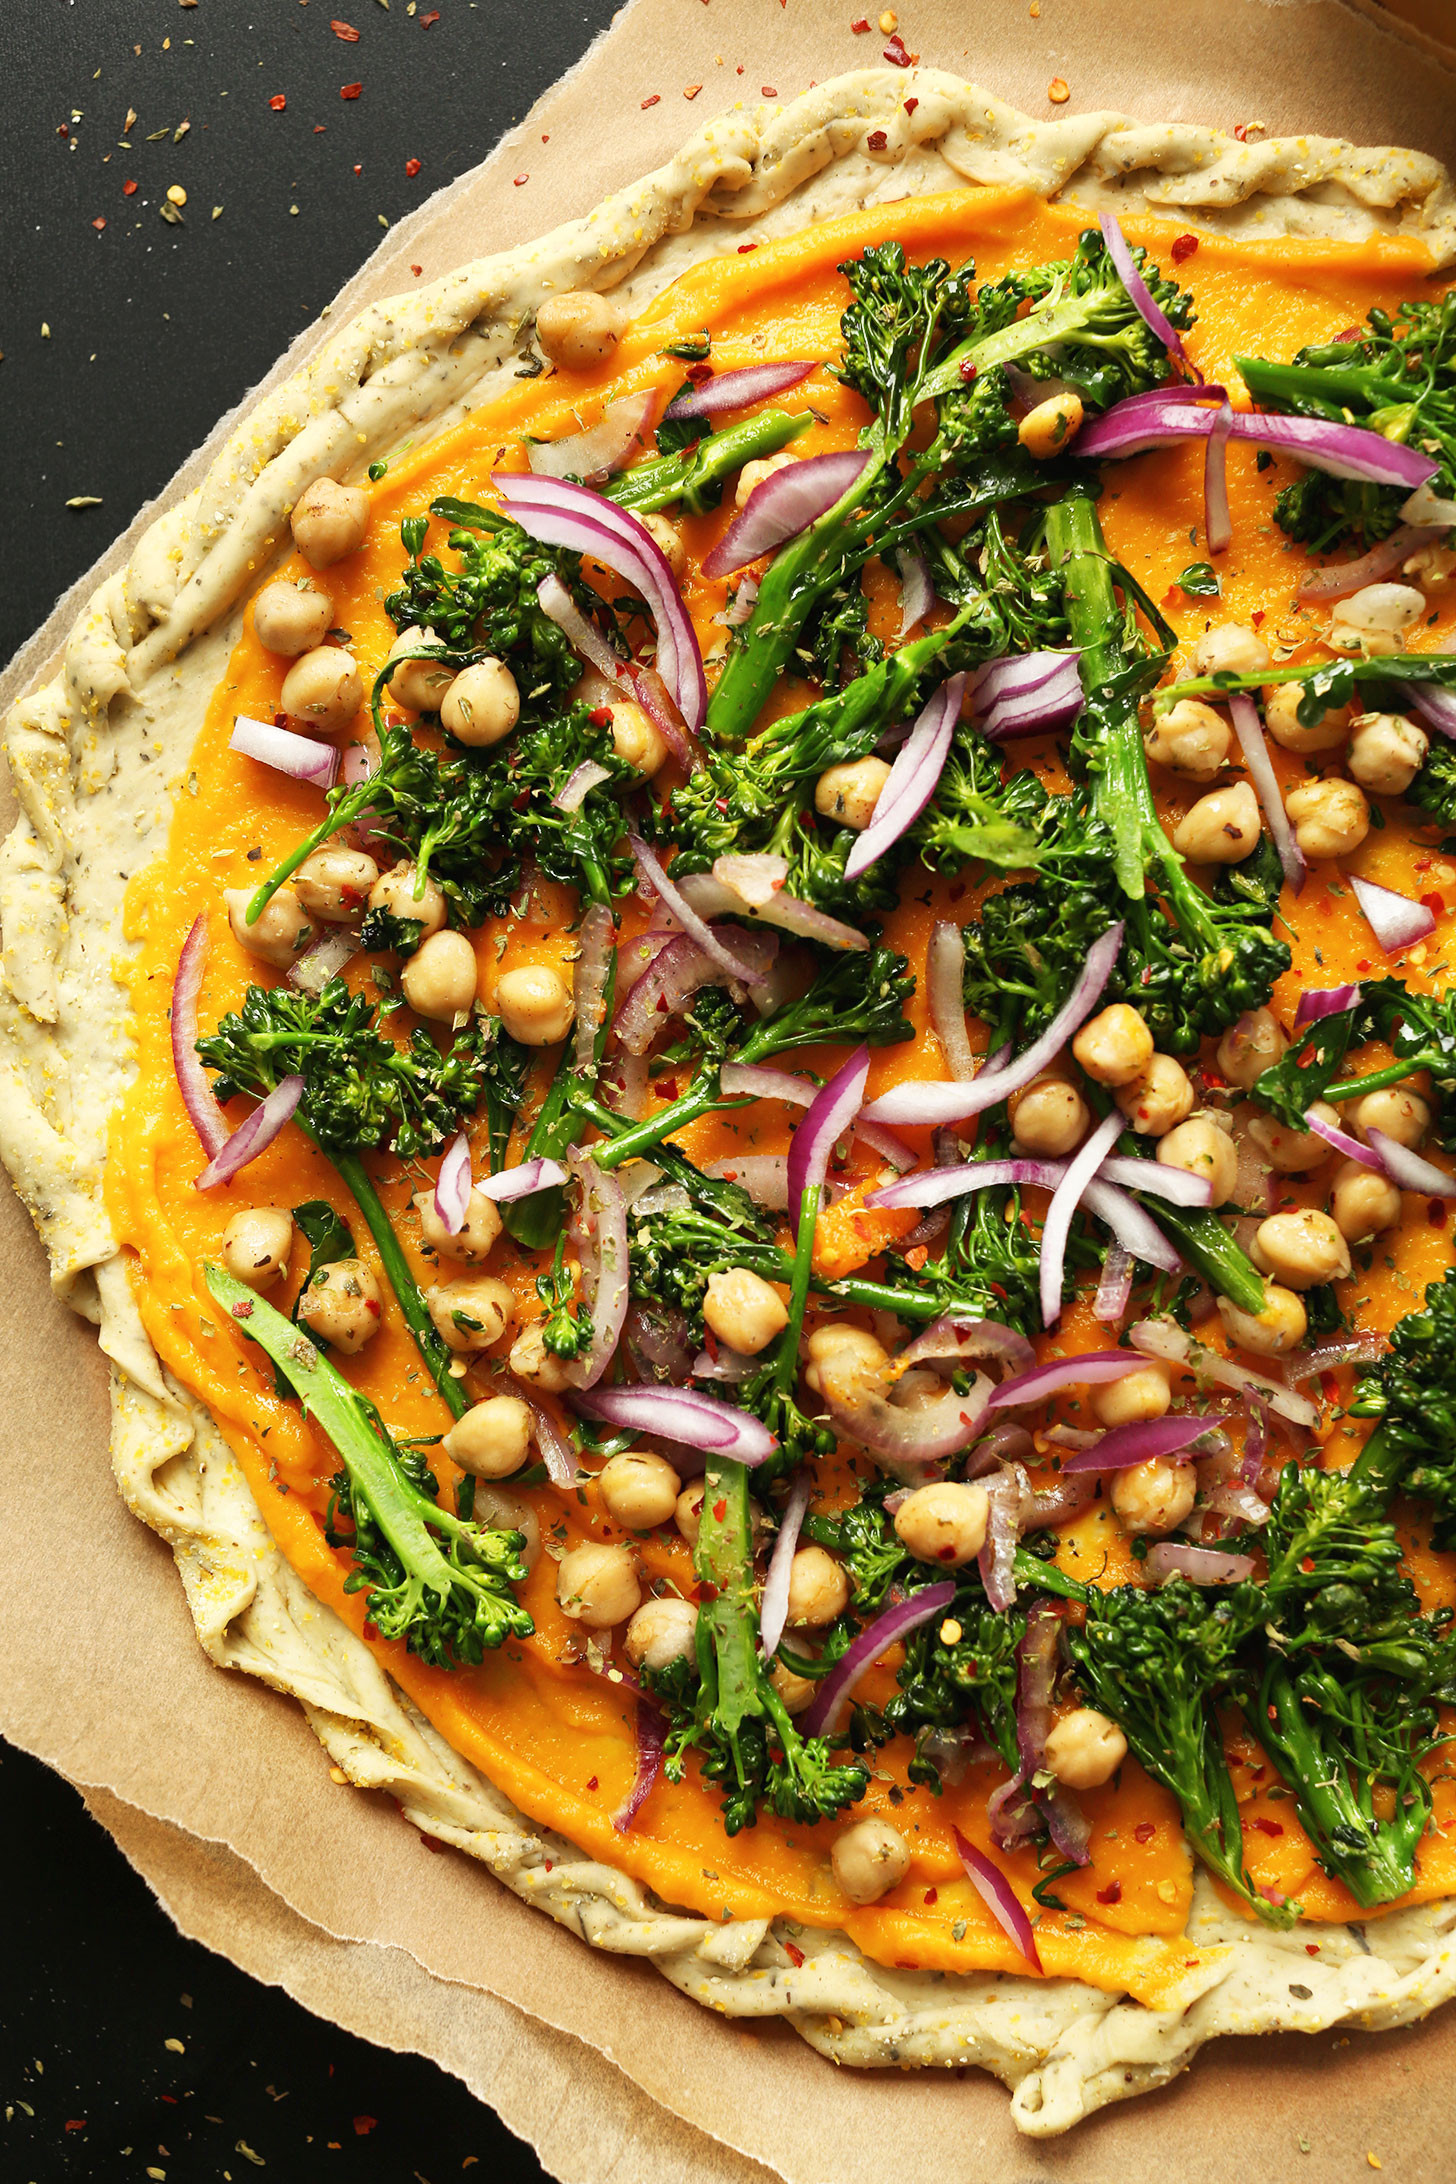 Vegan Recipes For Dinner  30 delicious vegan dinner recipes for happy tummies